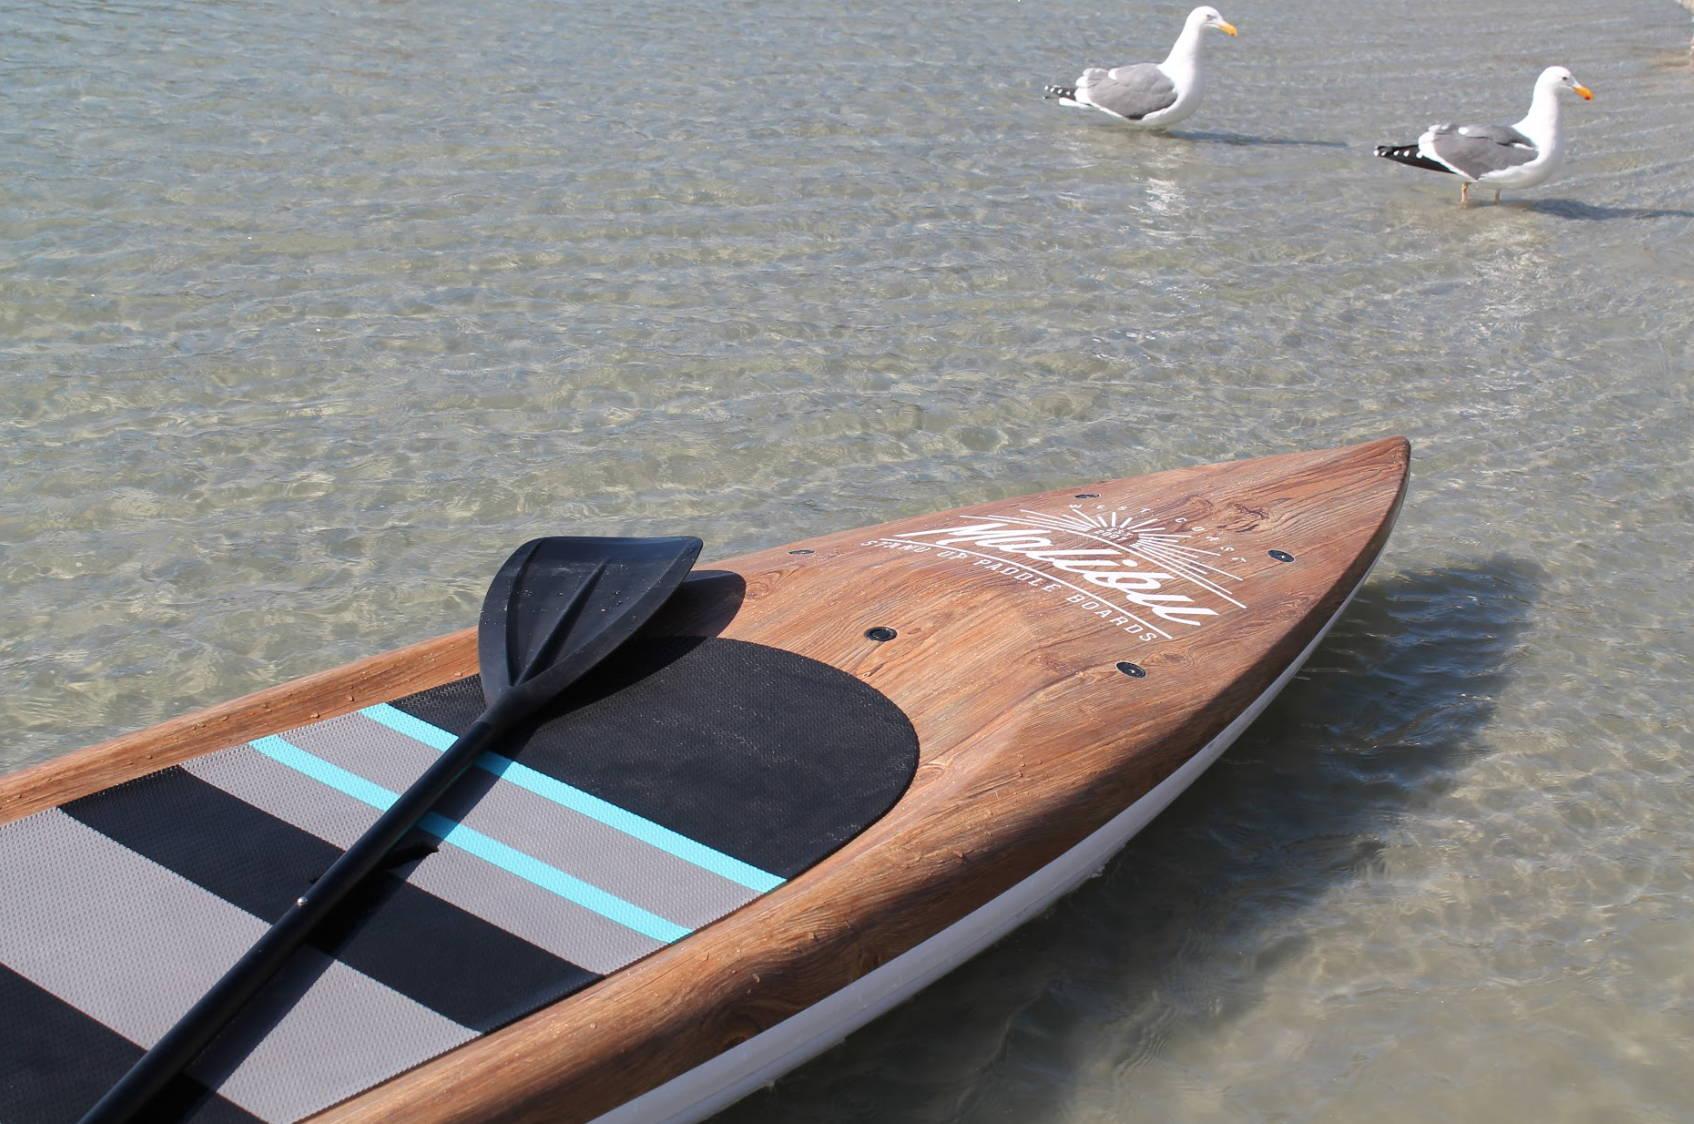 Malibu and Paddle WVT wood board in Orange County